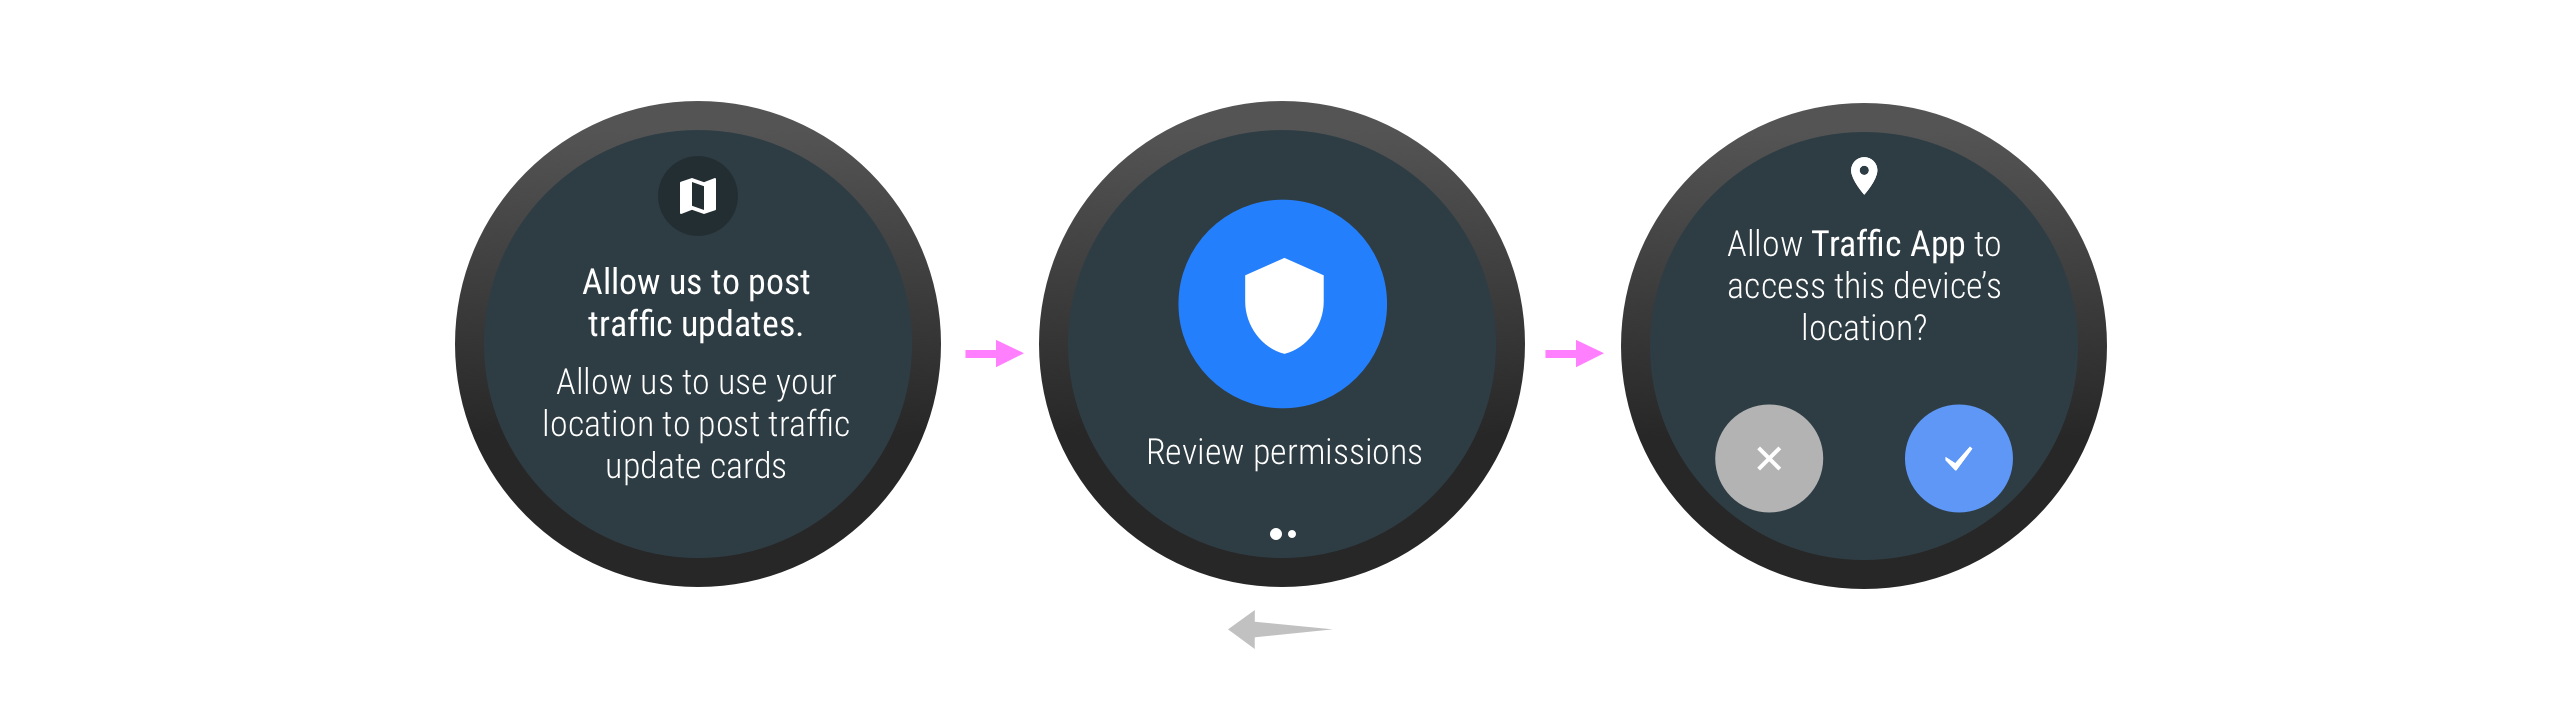 Pengguna mungkin harus memberikan izin ketika secara tidak langsung berinteraksi dengan aplikasi, melalui layanan.